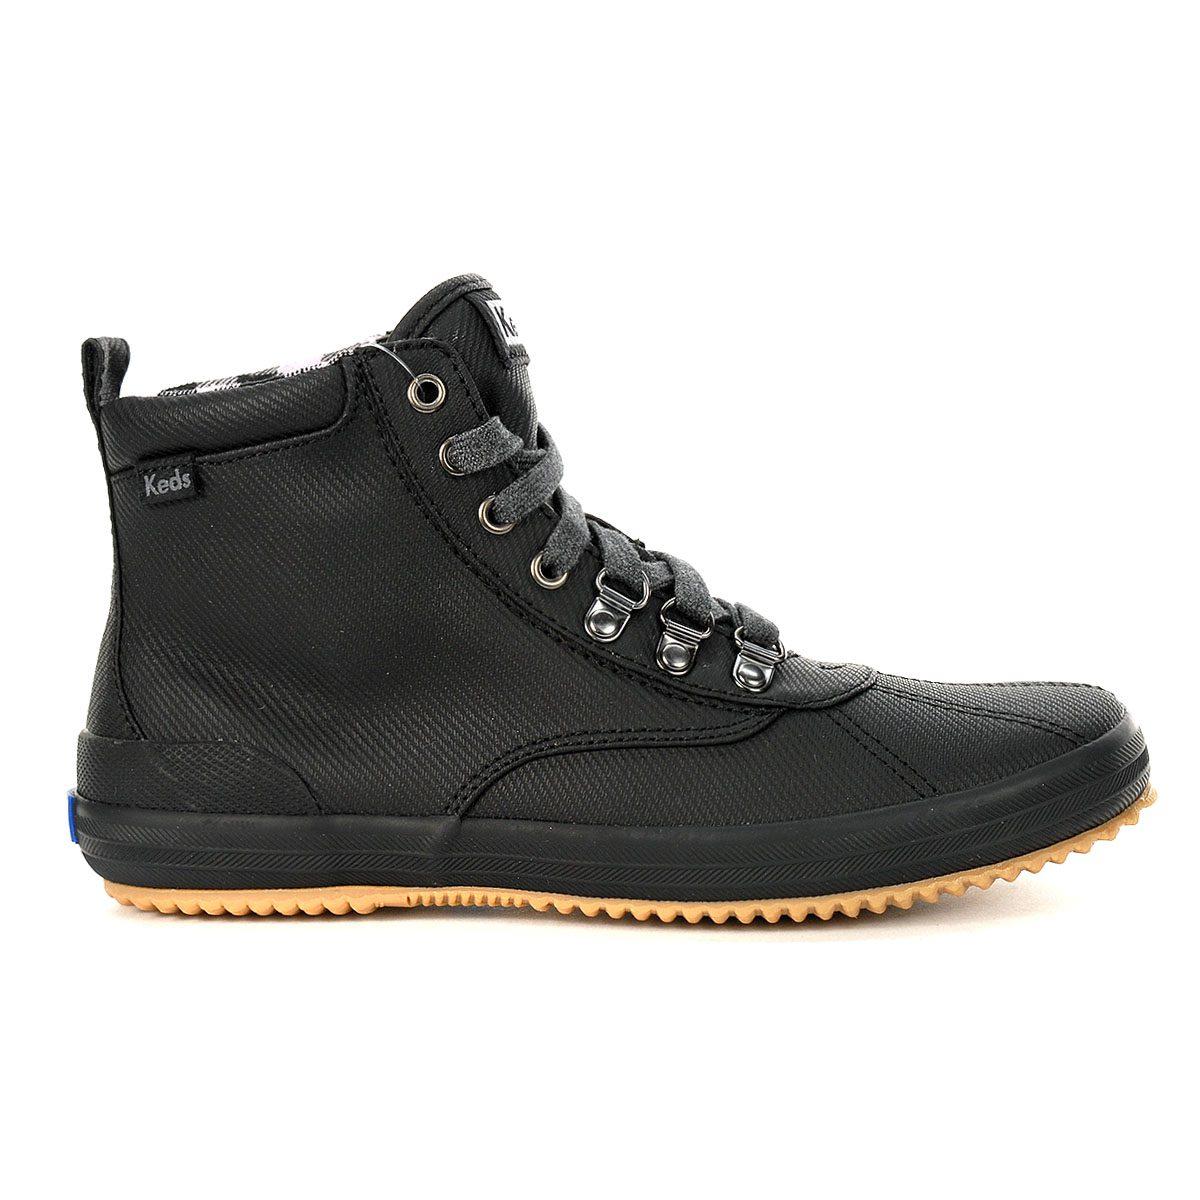 Scout BT 2 Twill Black Lace